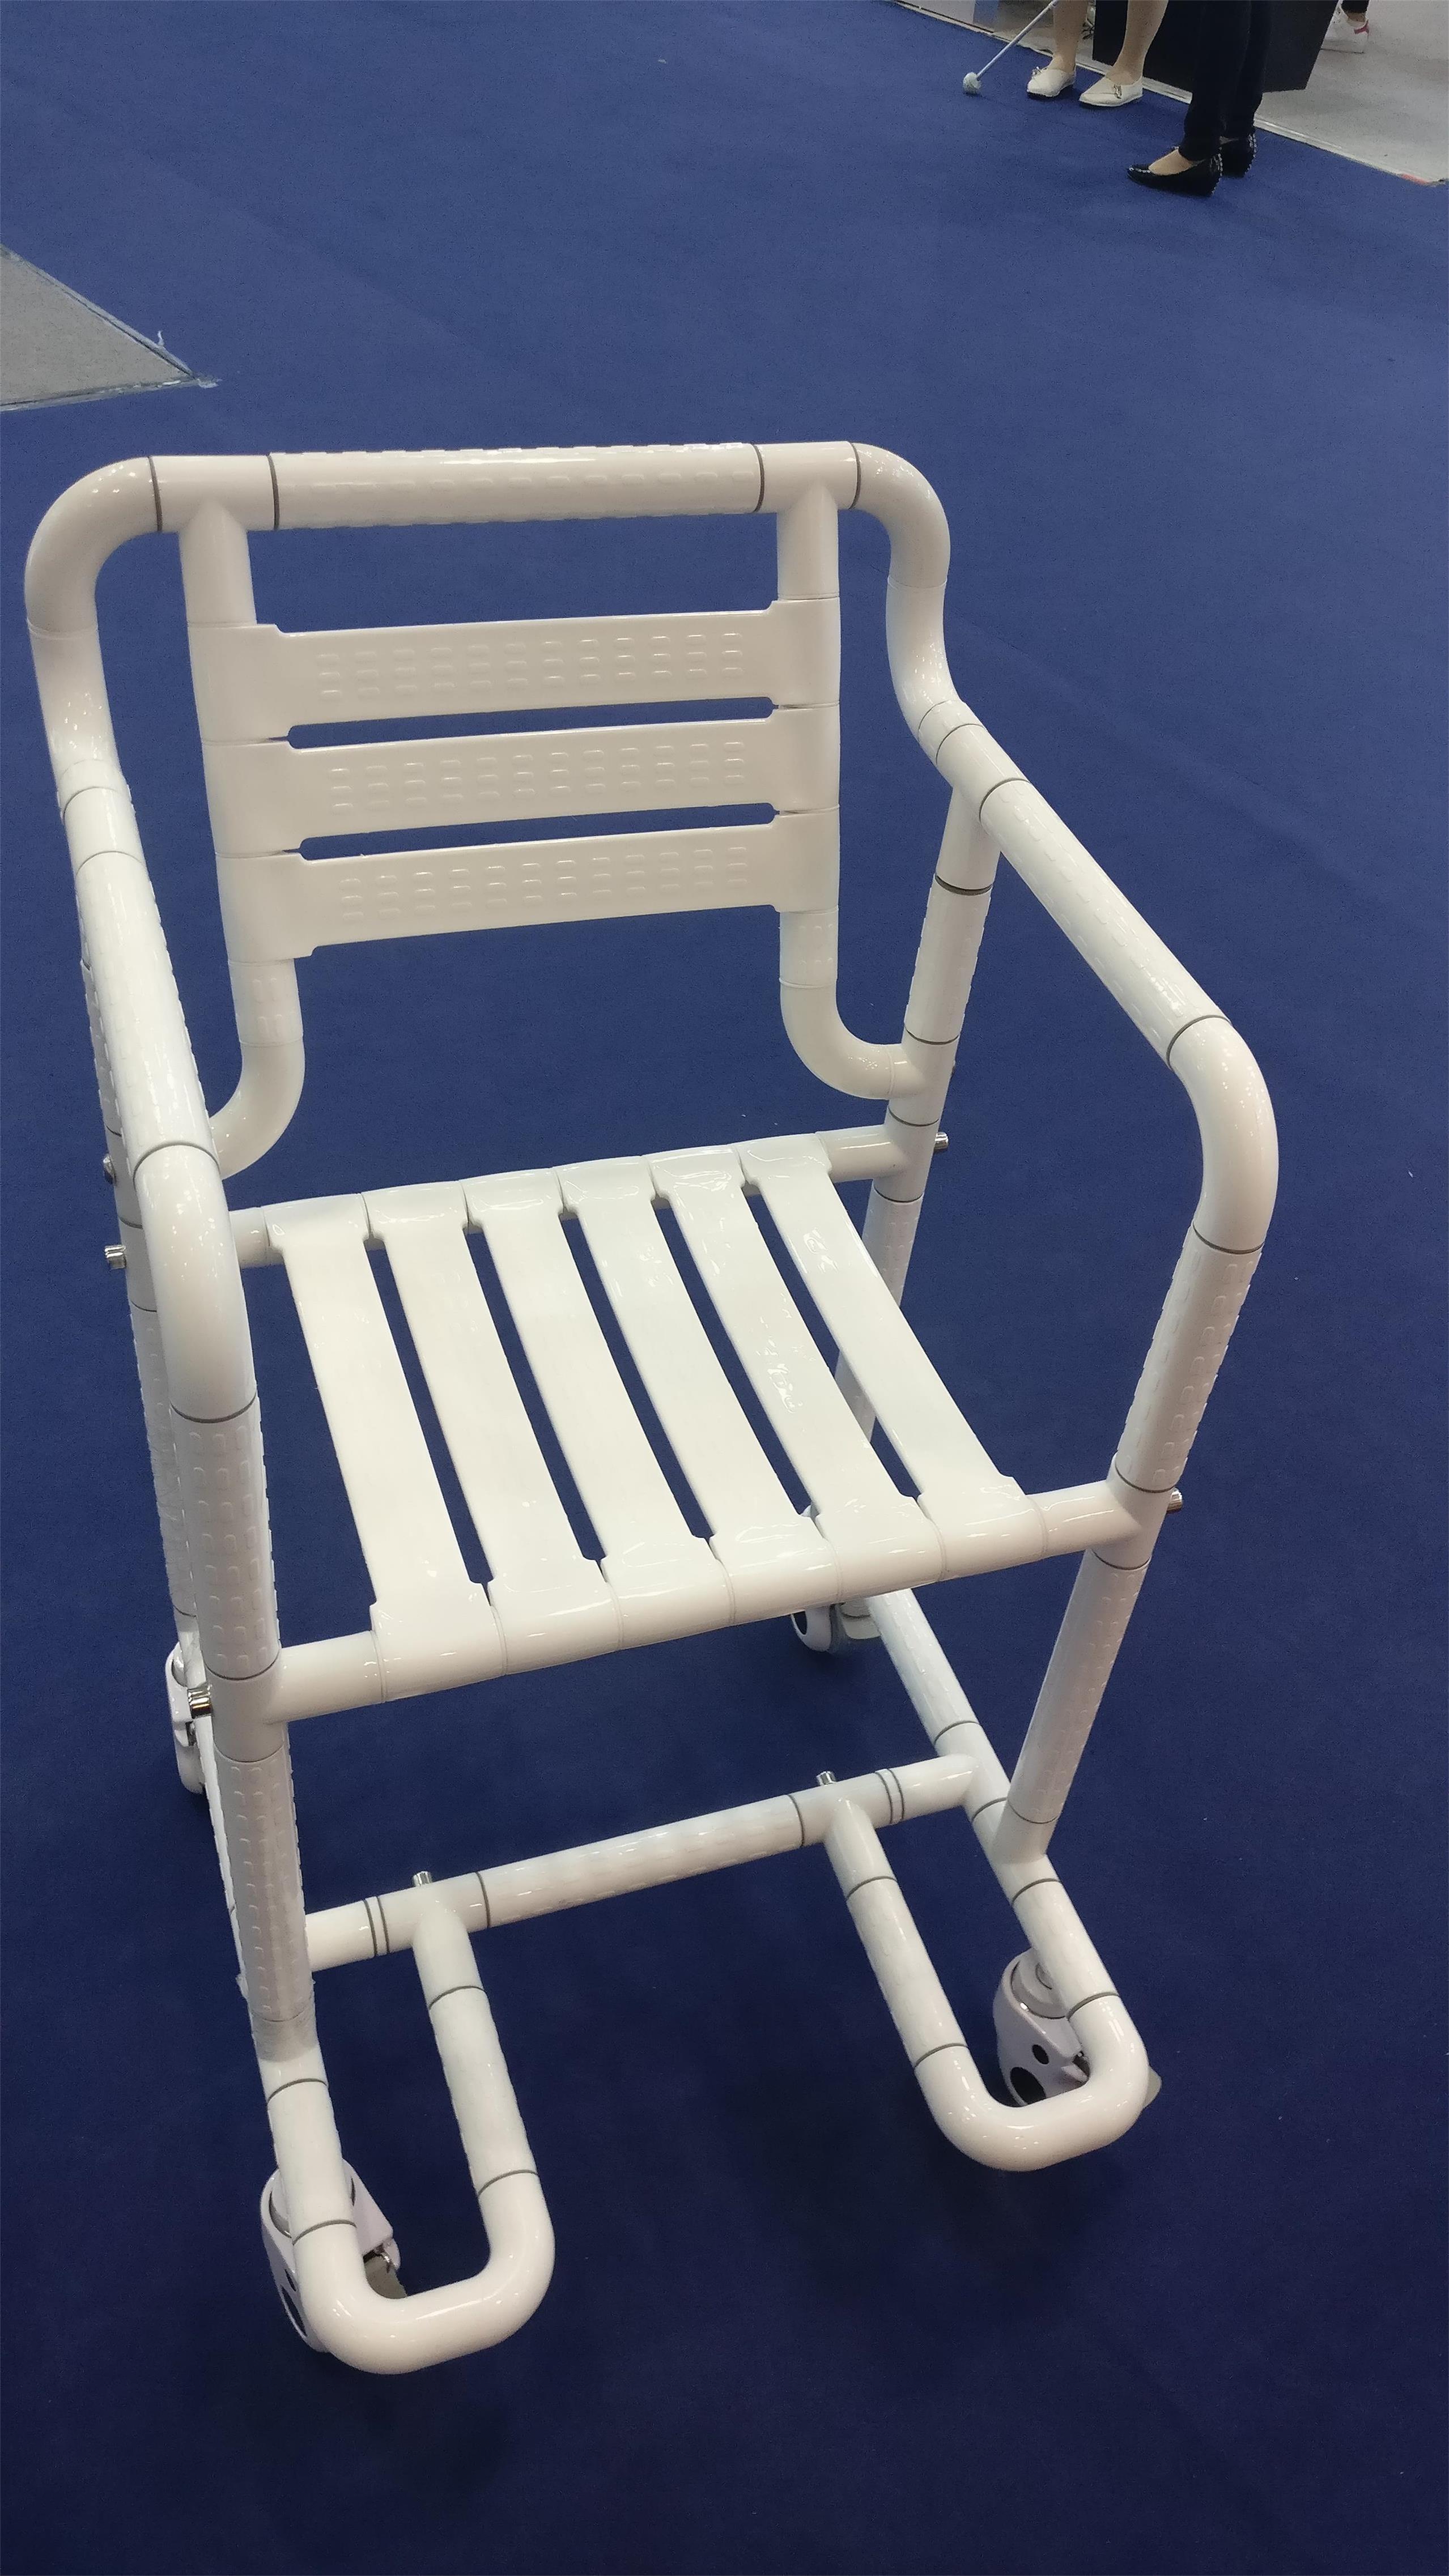 多功能坐便椅 BF100-14